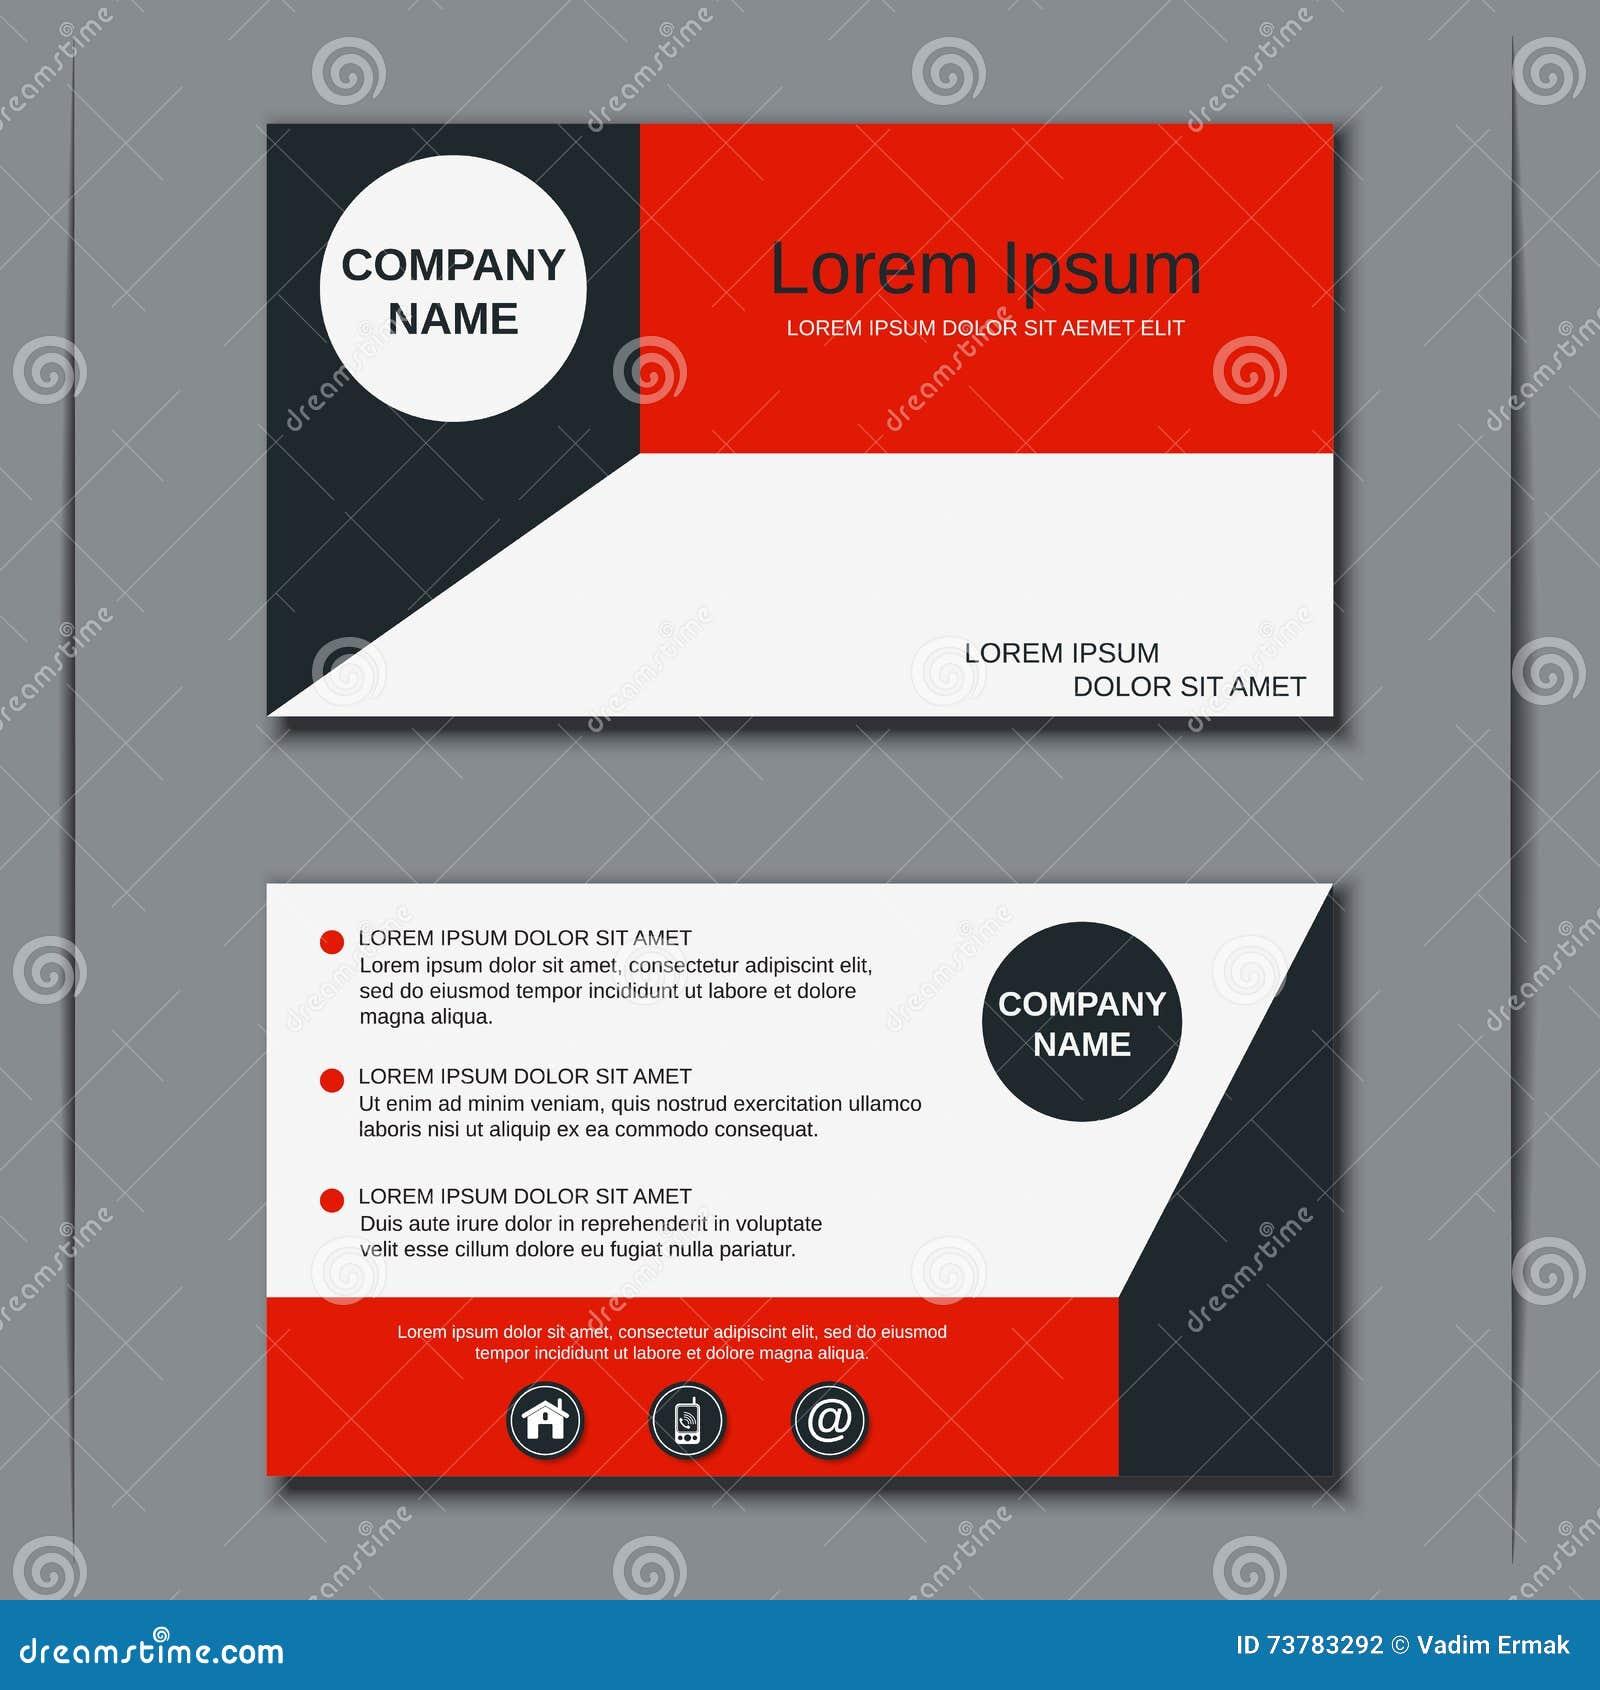 Modern Business Visiting Card Design Stock Vector - Image: 73783292